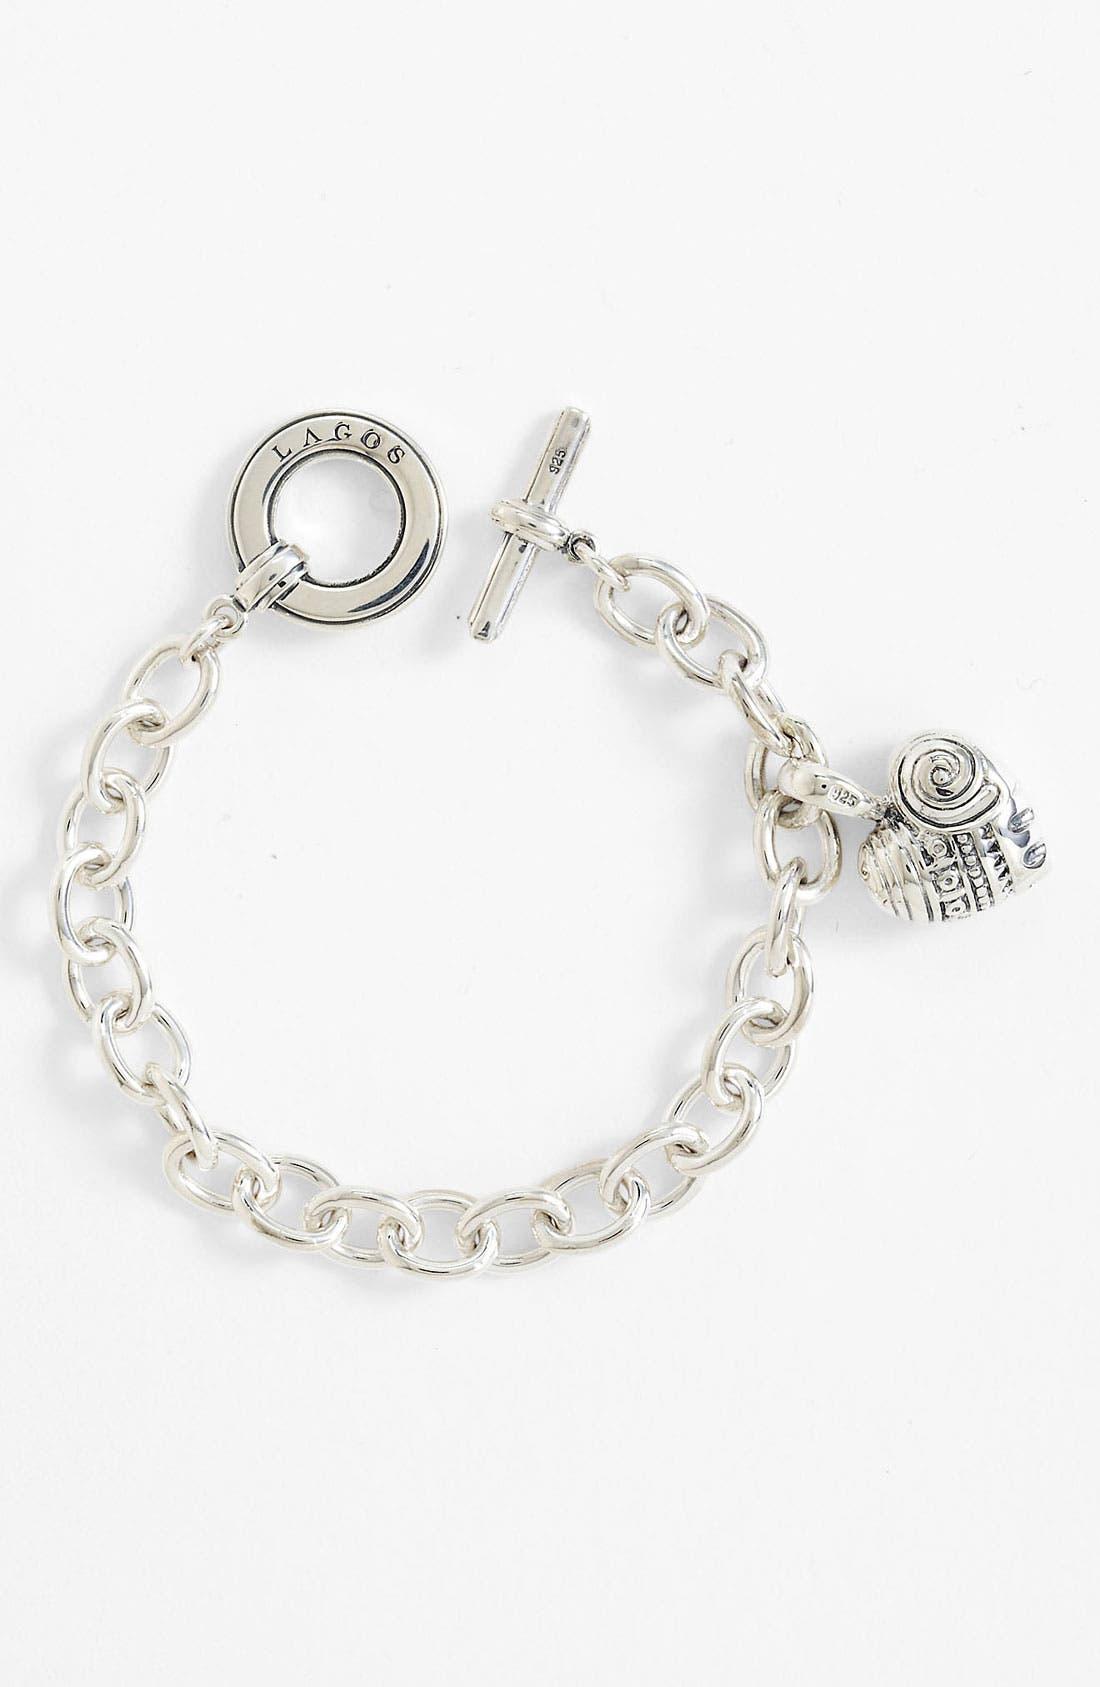 'Hearts of LAGOS' Charm Bracelet,                             Alternate thumbnail 2, color,                             Heart Of New York